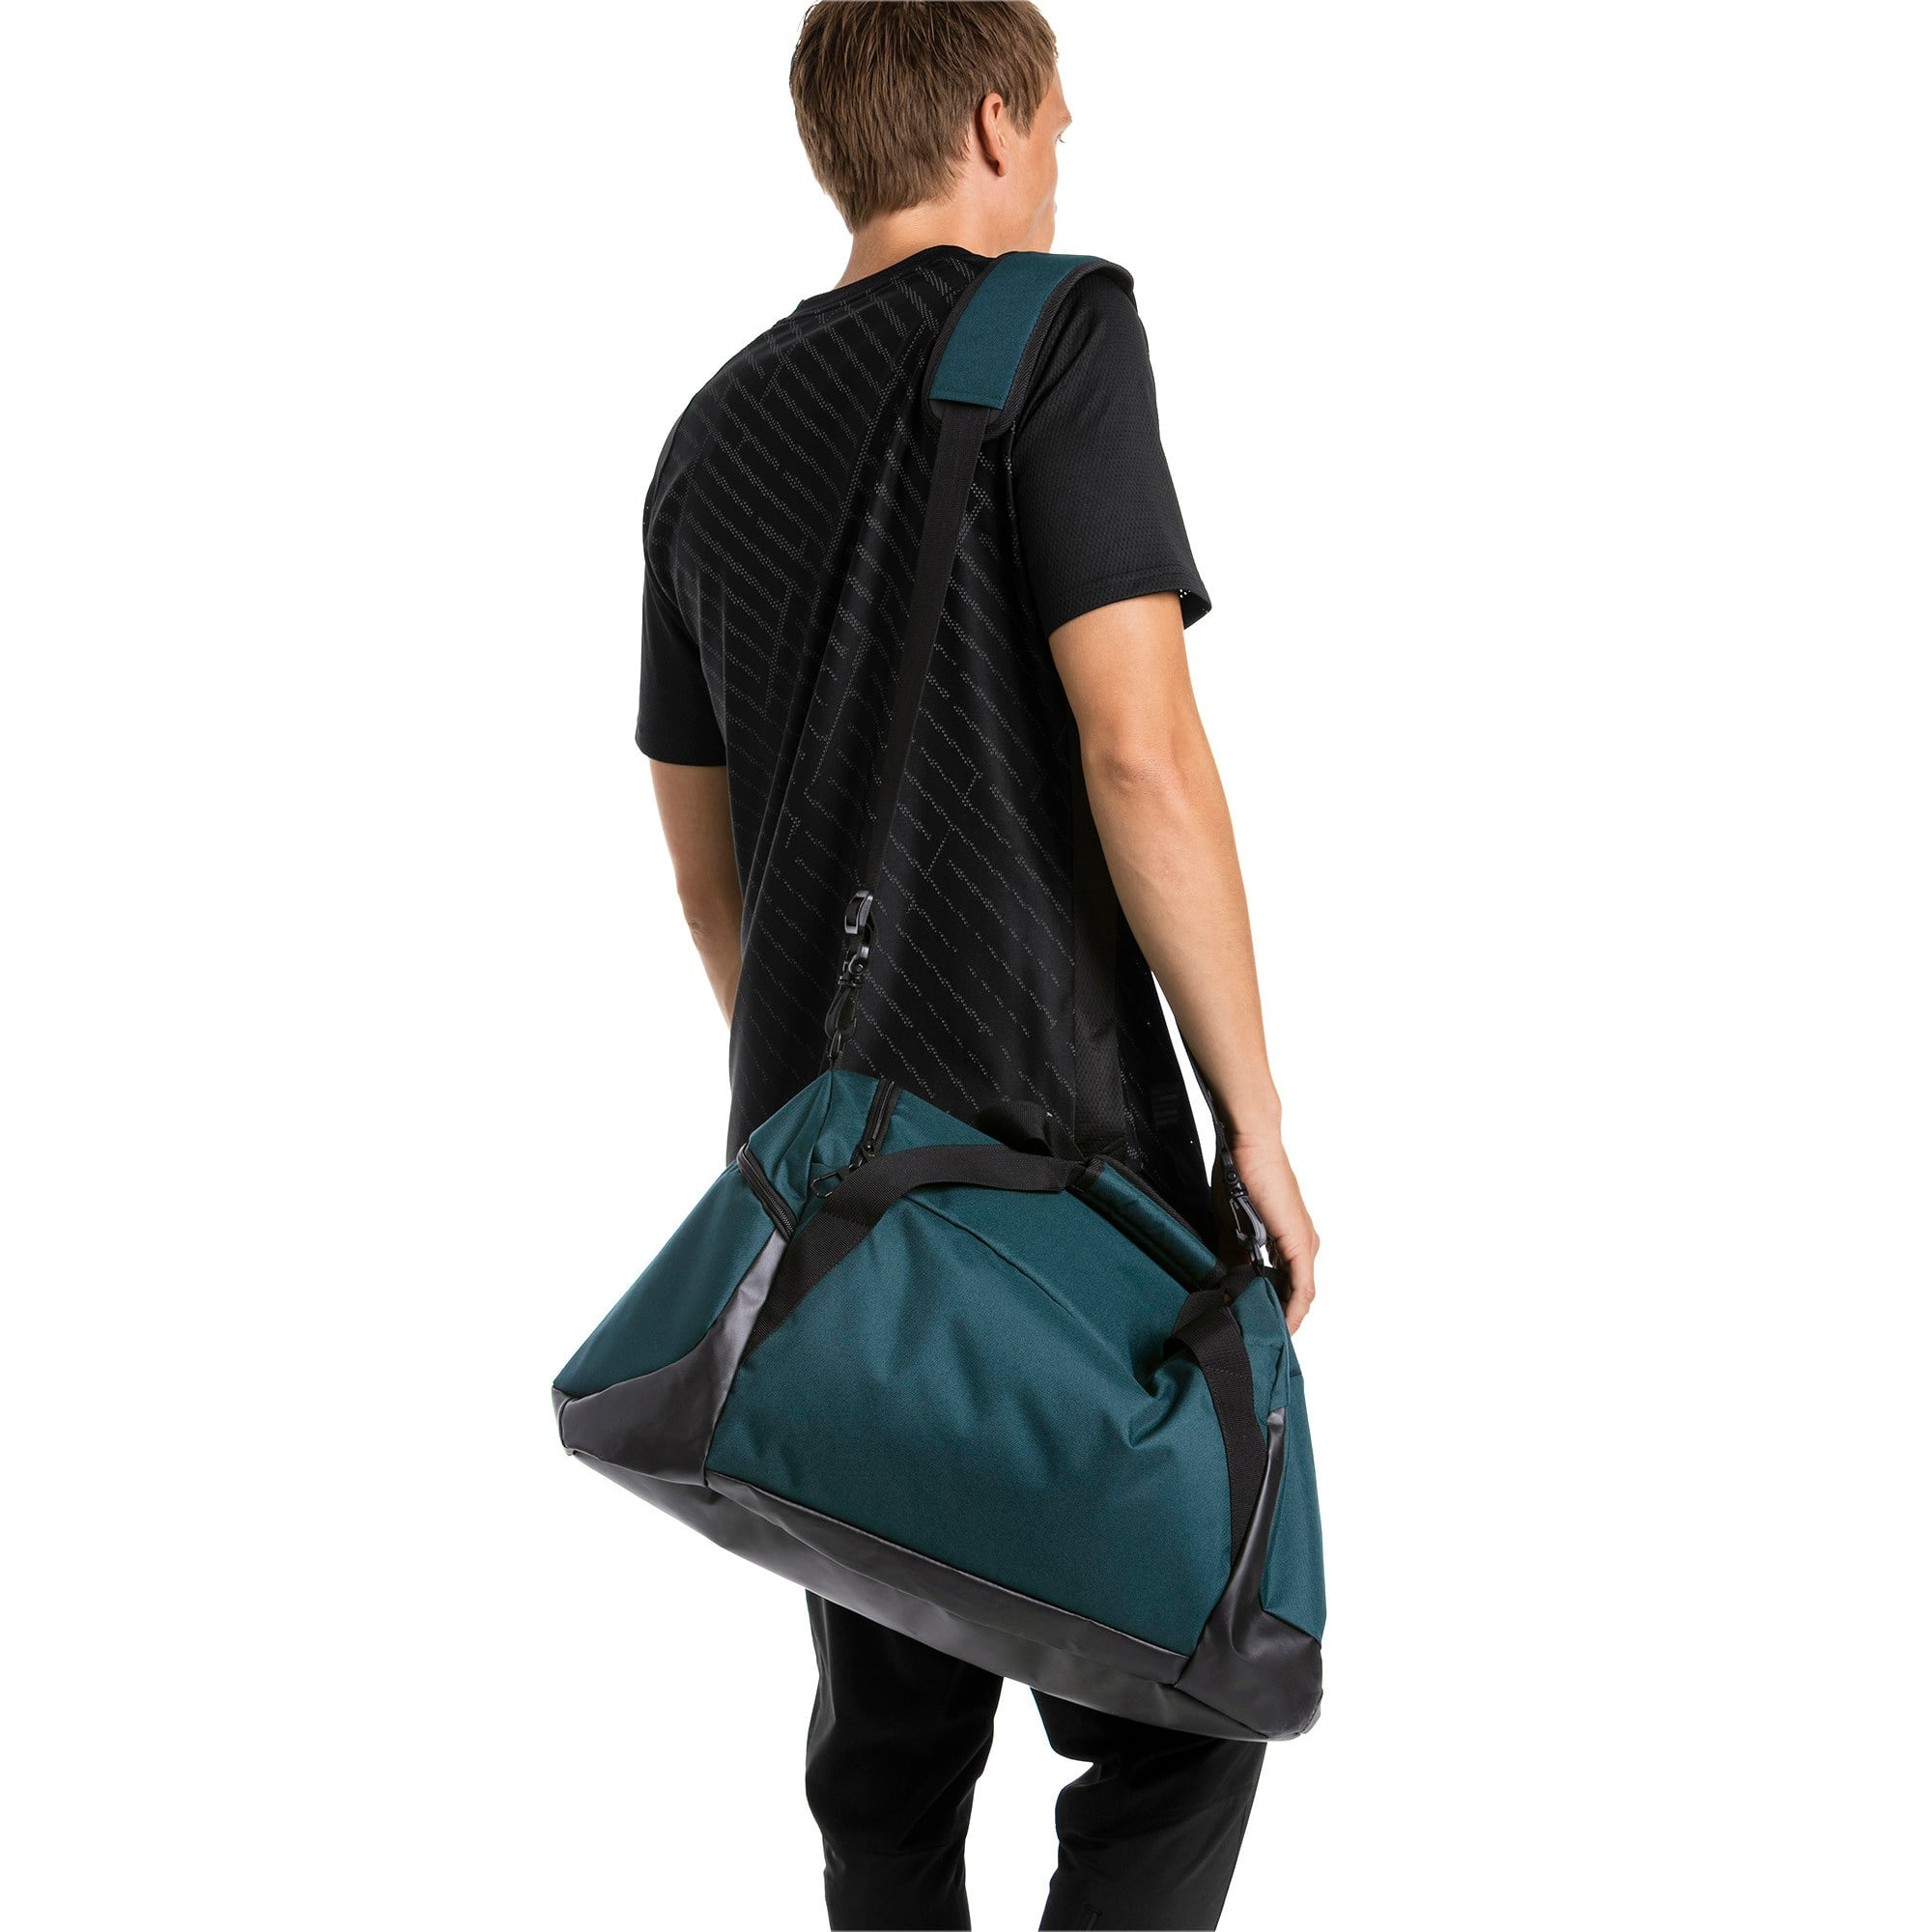 Thumbnail 2 of GYM Medium Duffle Bag, Ponderosa Pine, medium